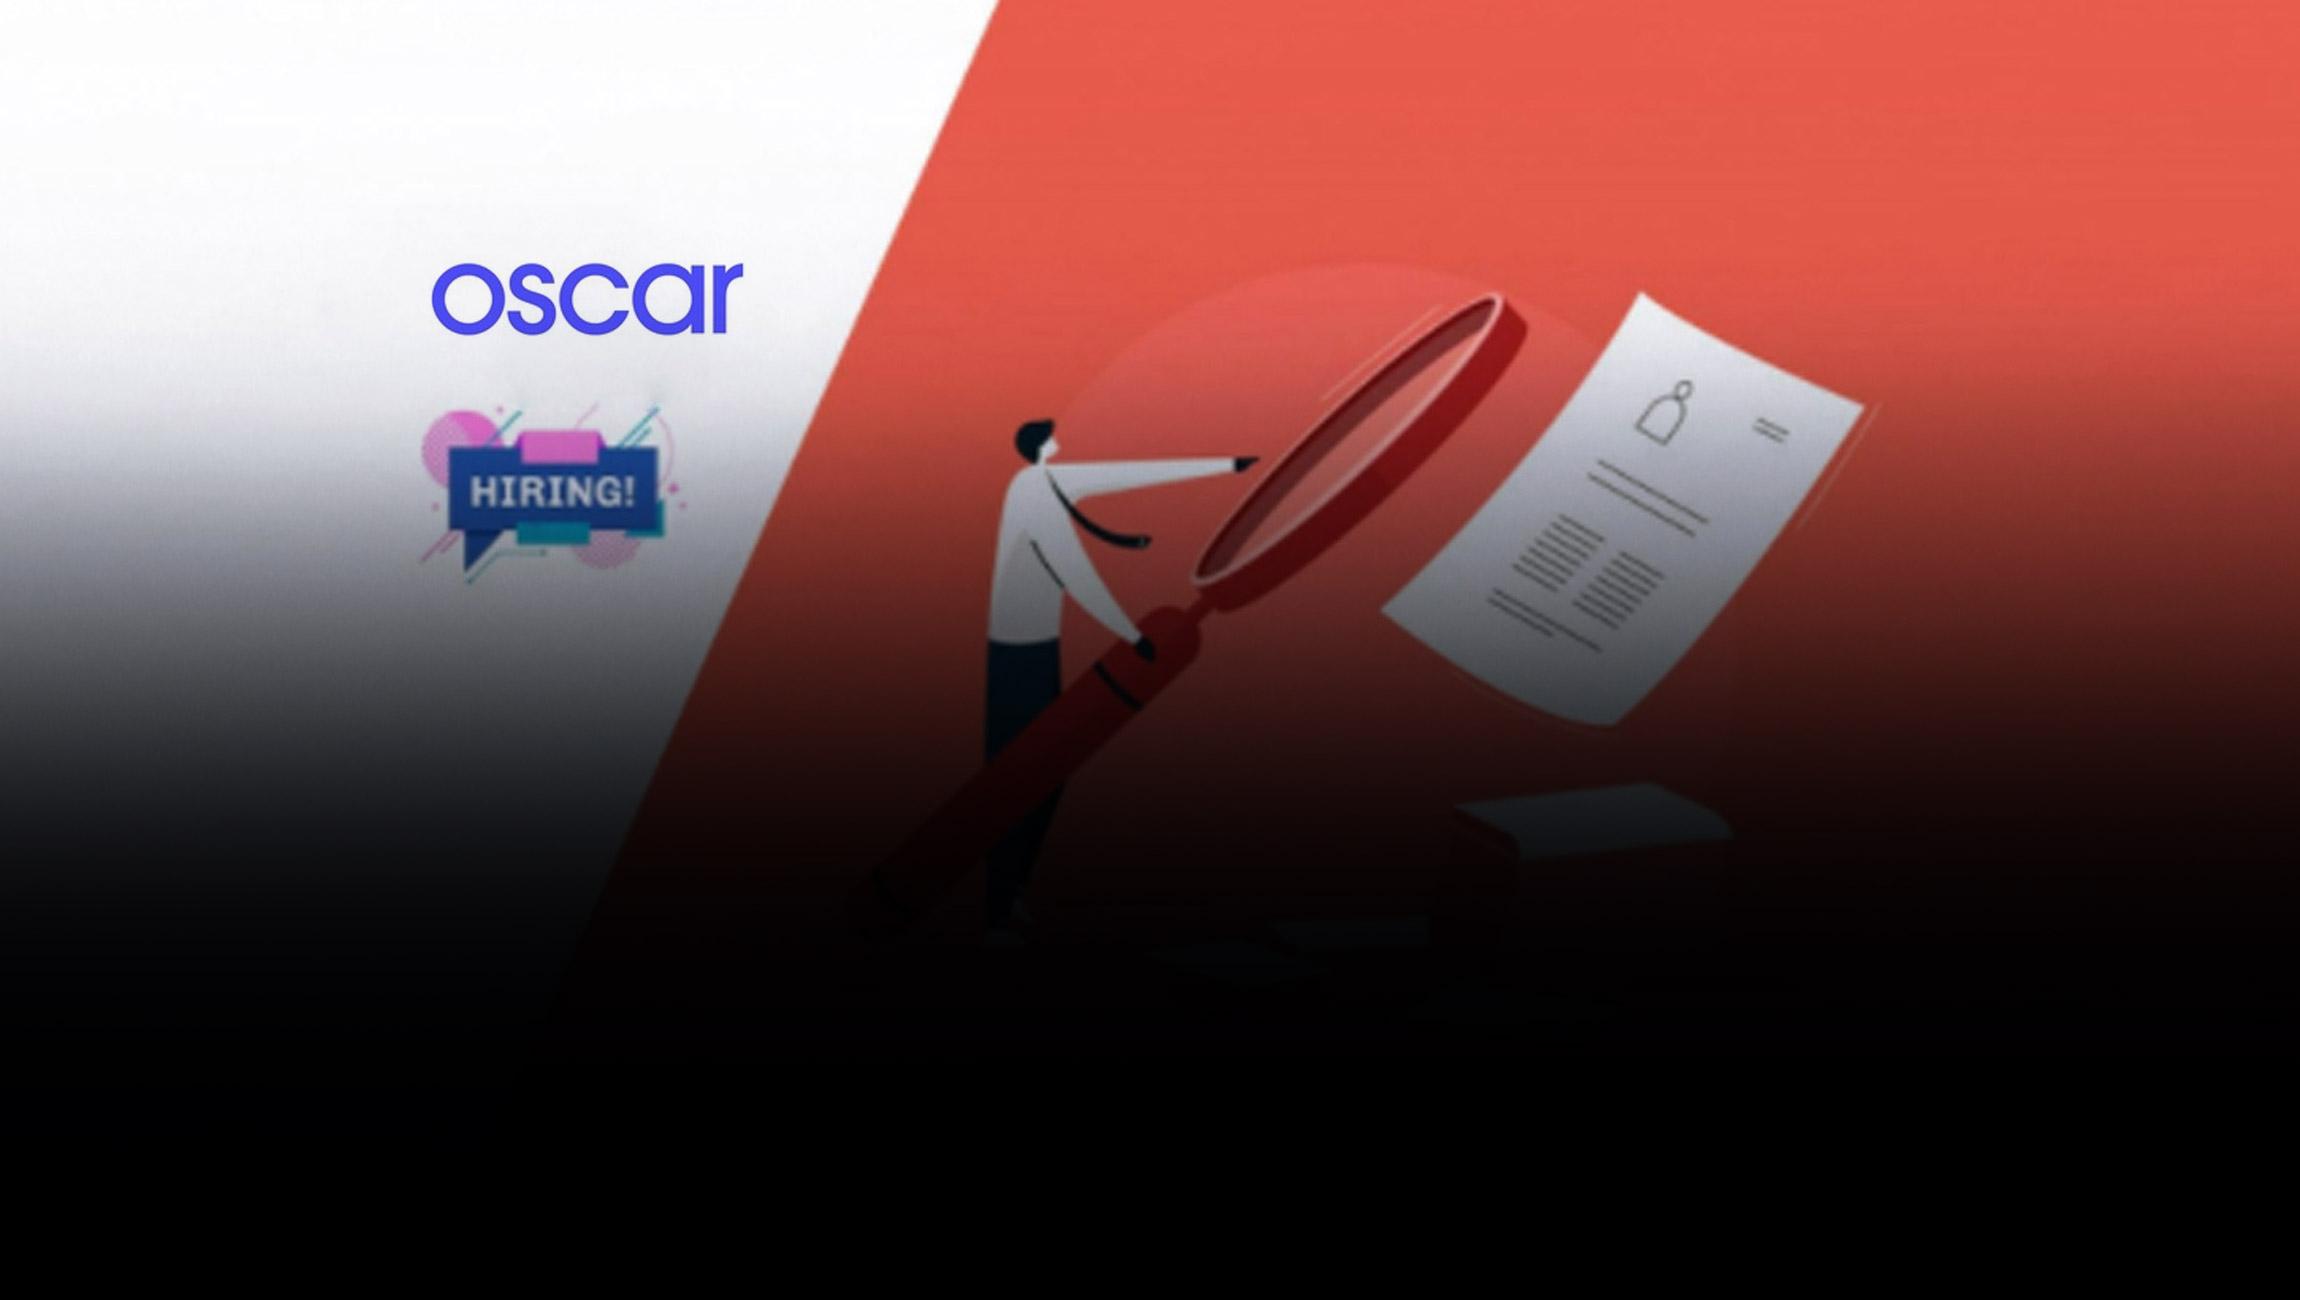 R. Scott Blackley Joins Oscar as Chief Financial Officer